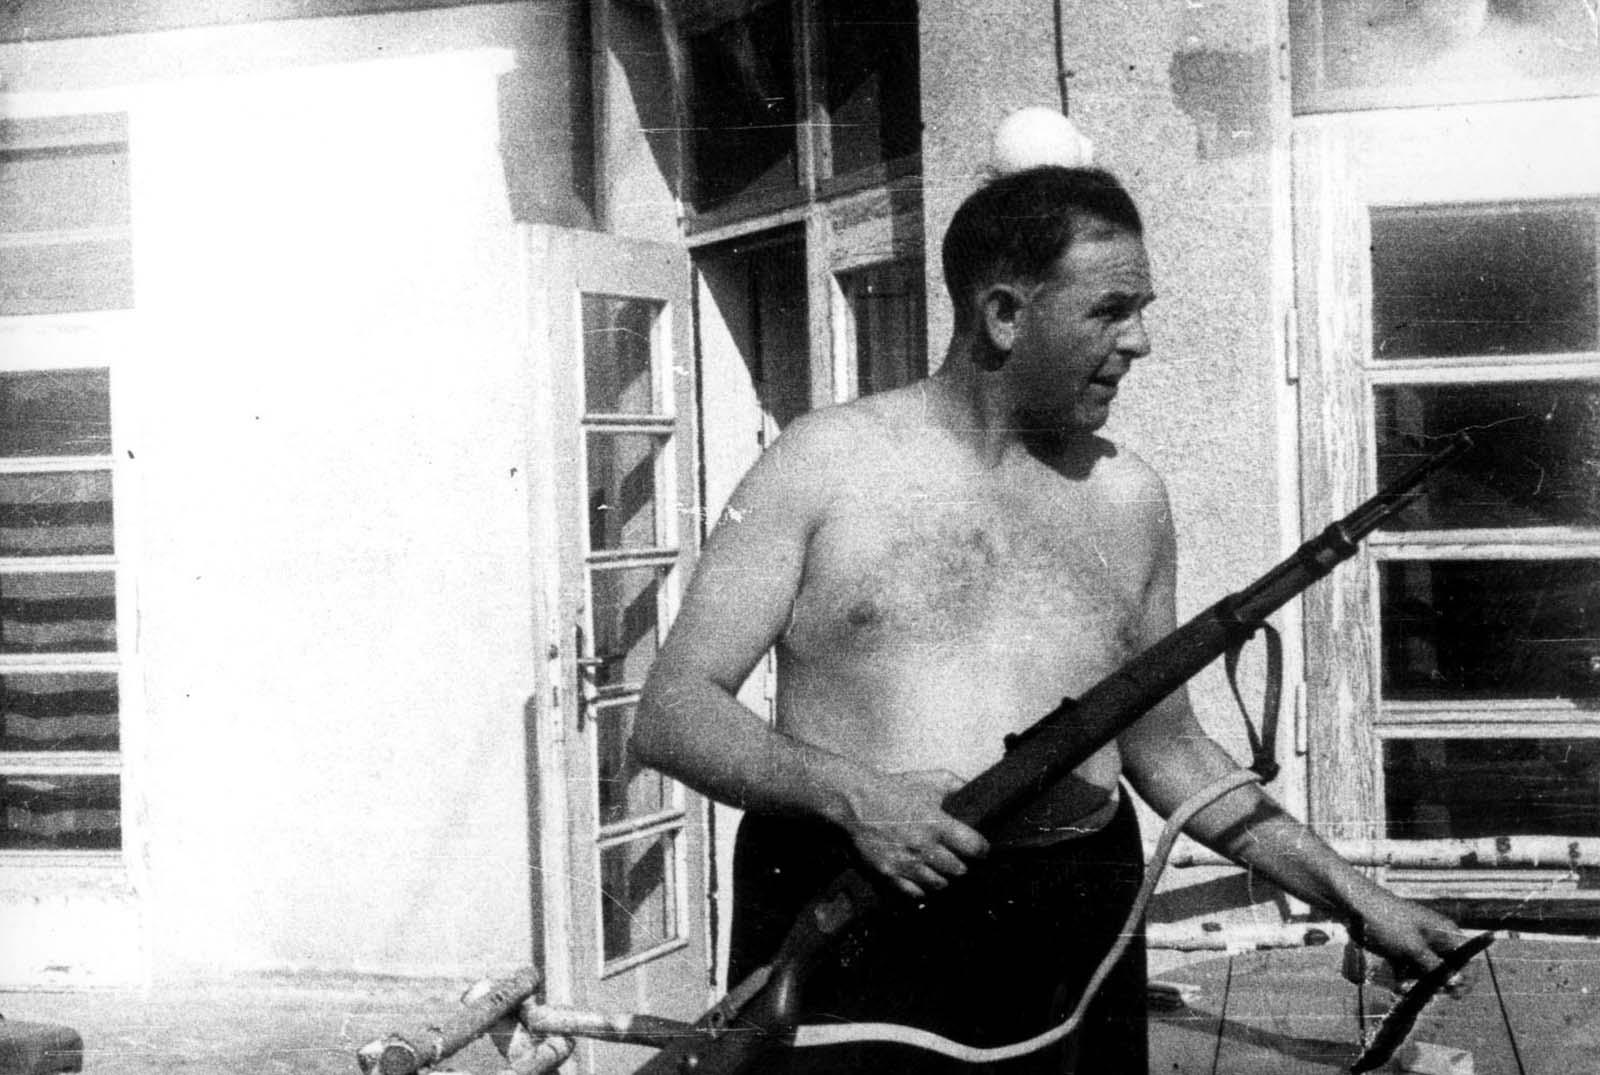 Commandant Amon Leopold Goeth holding a military rifle.